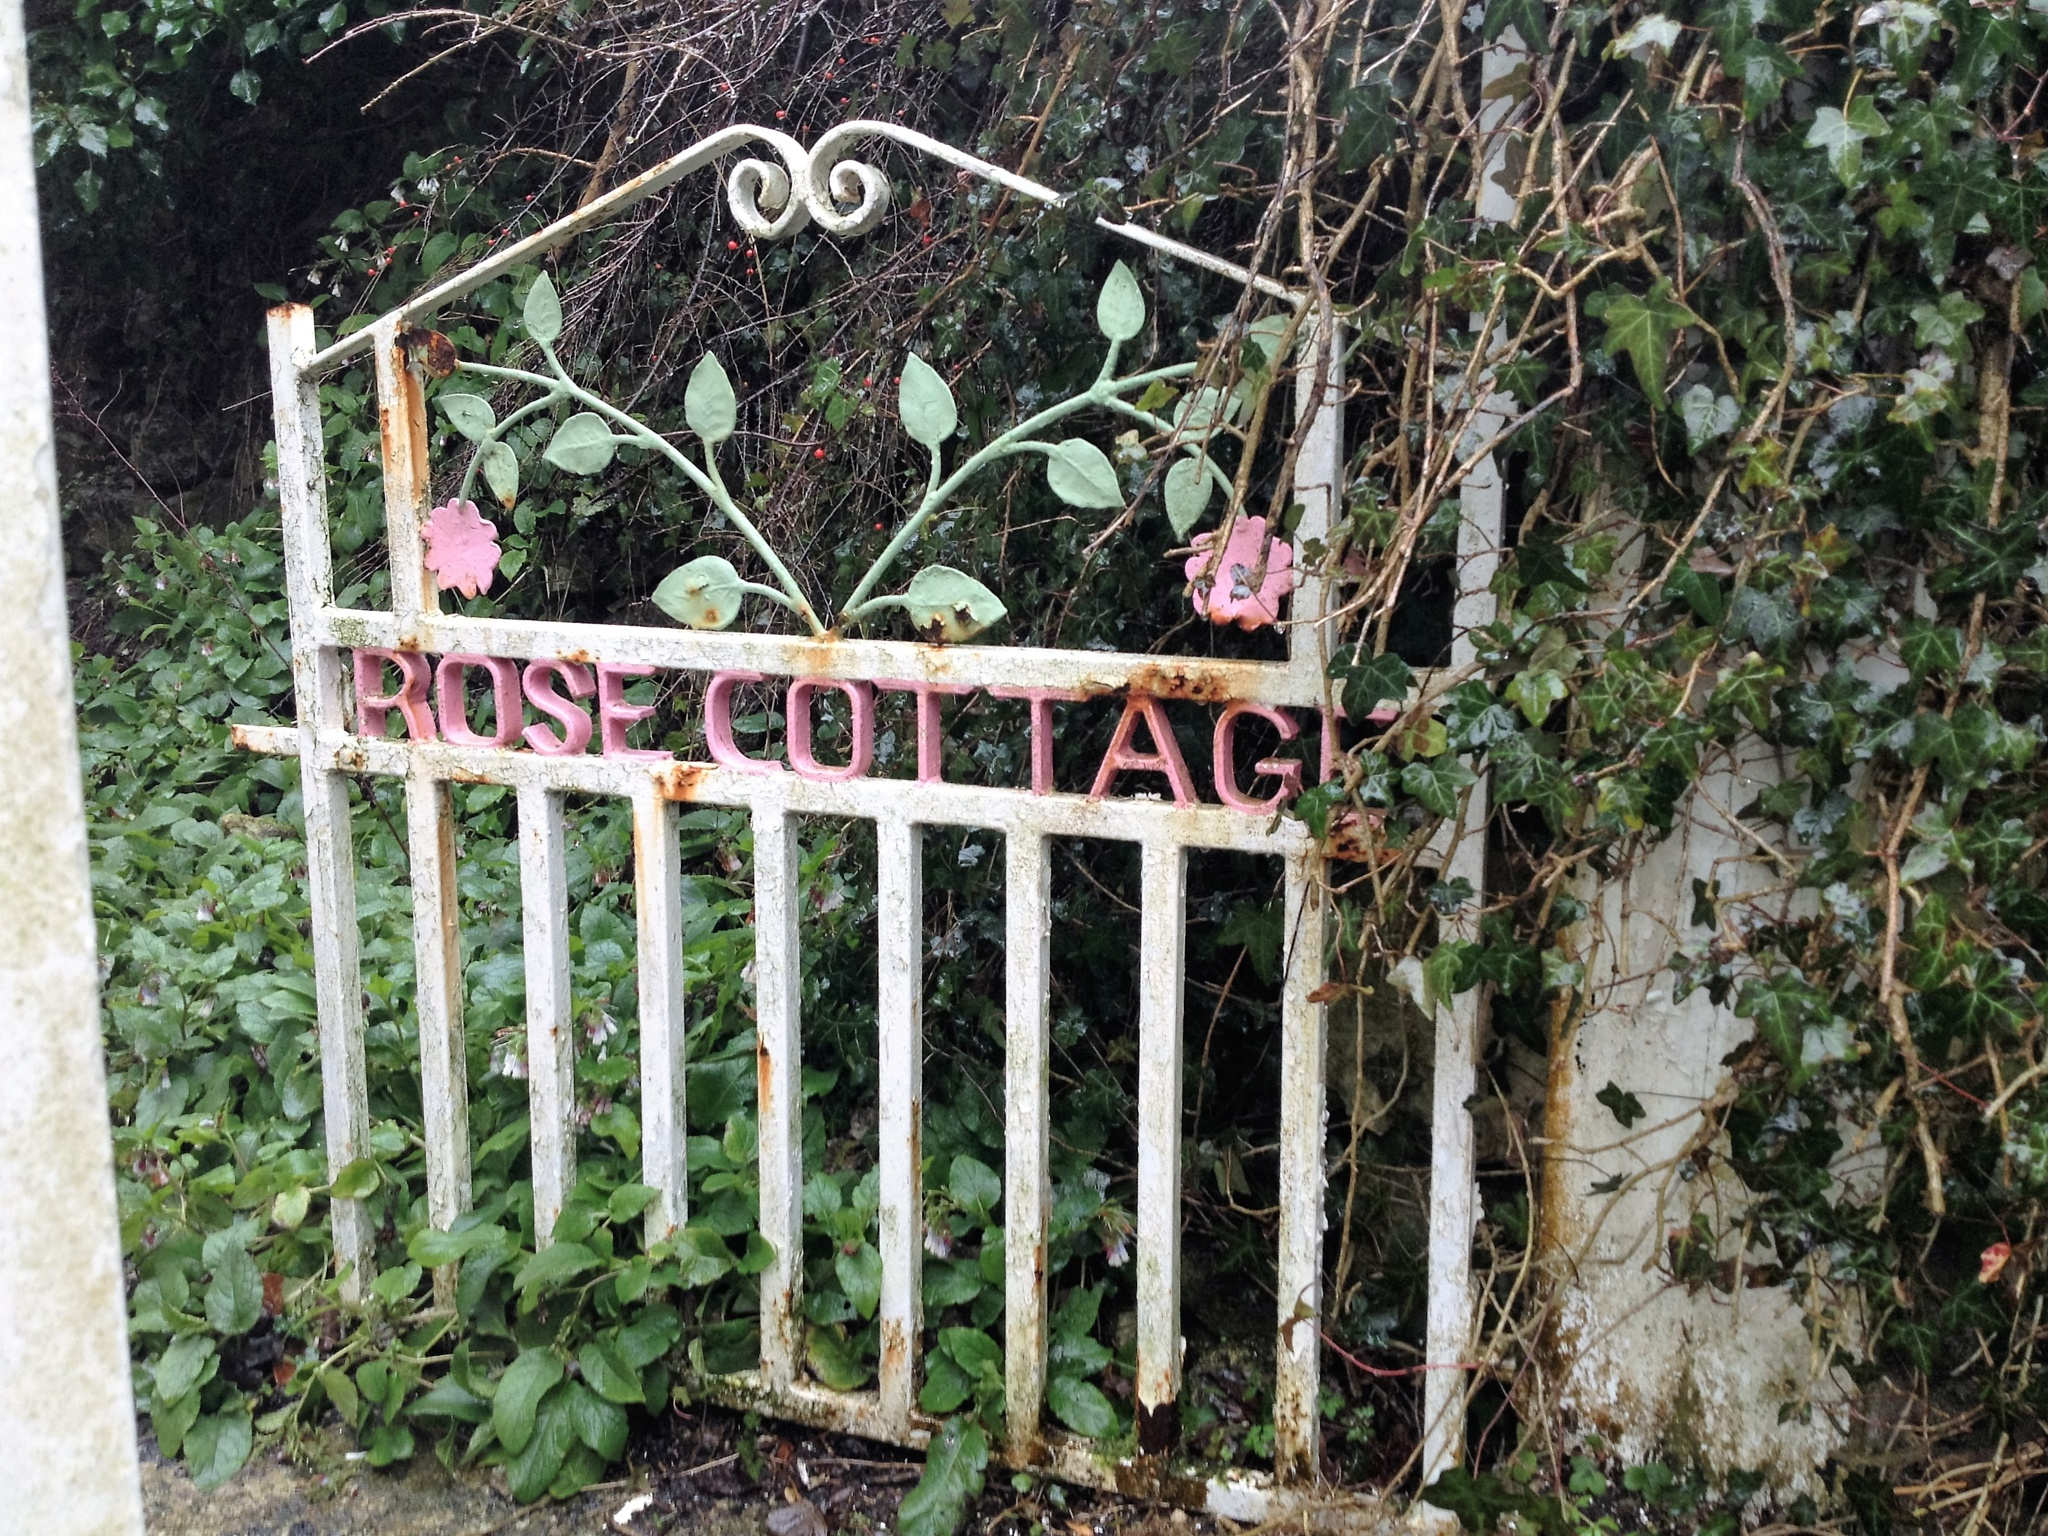 Cottage Gate by Bev Hynes